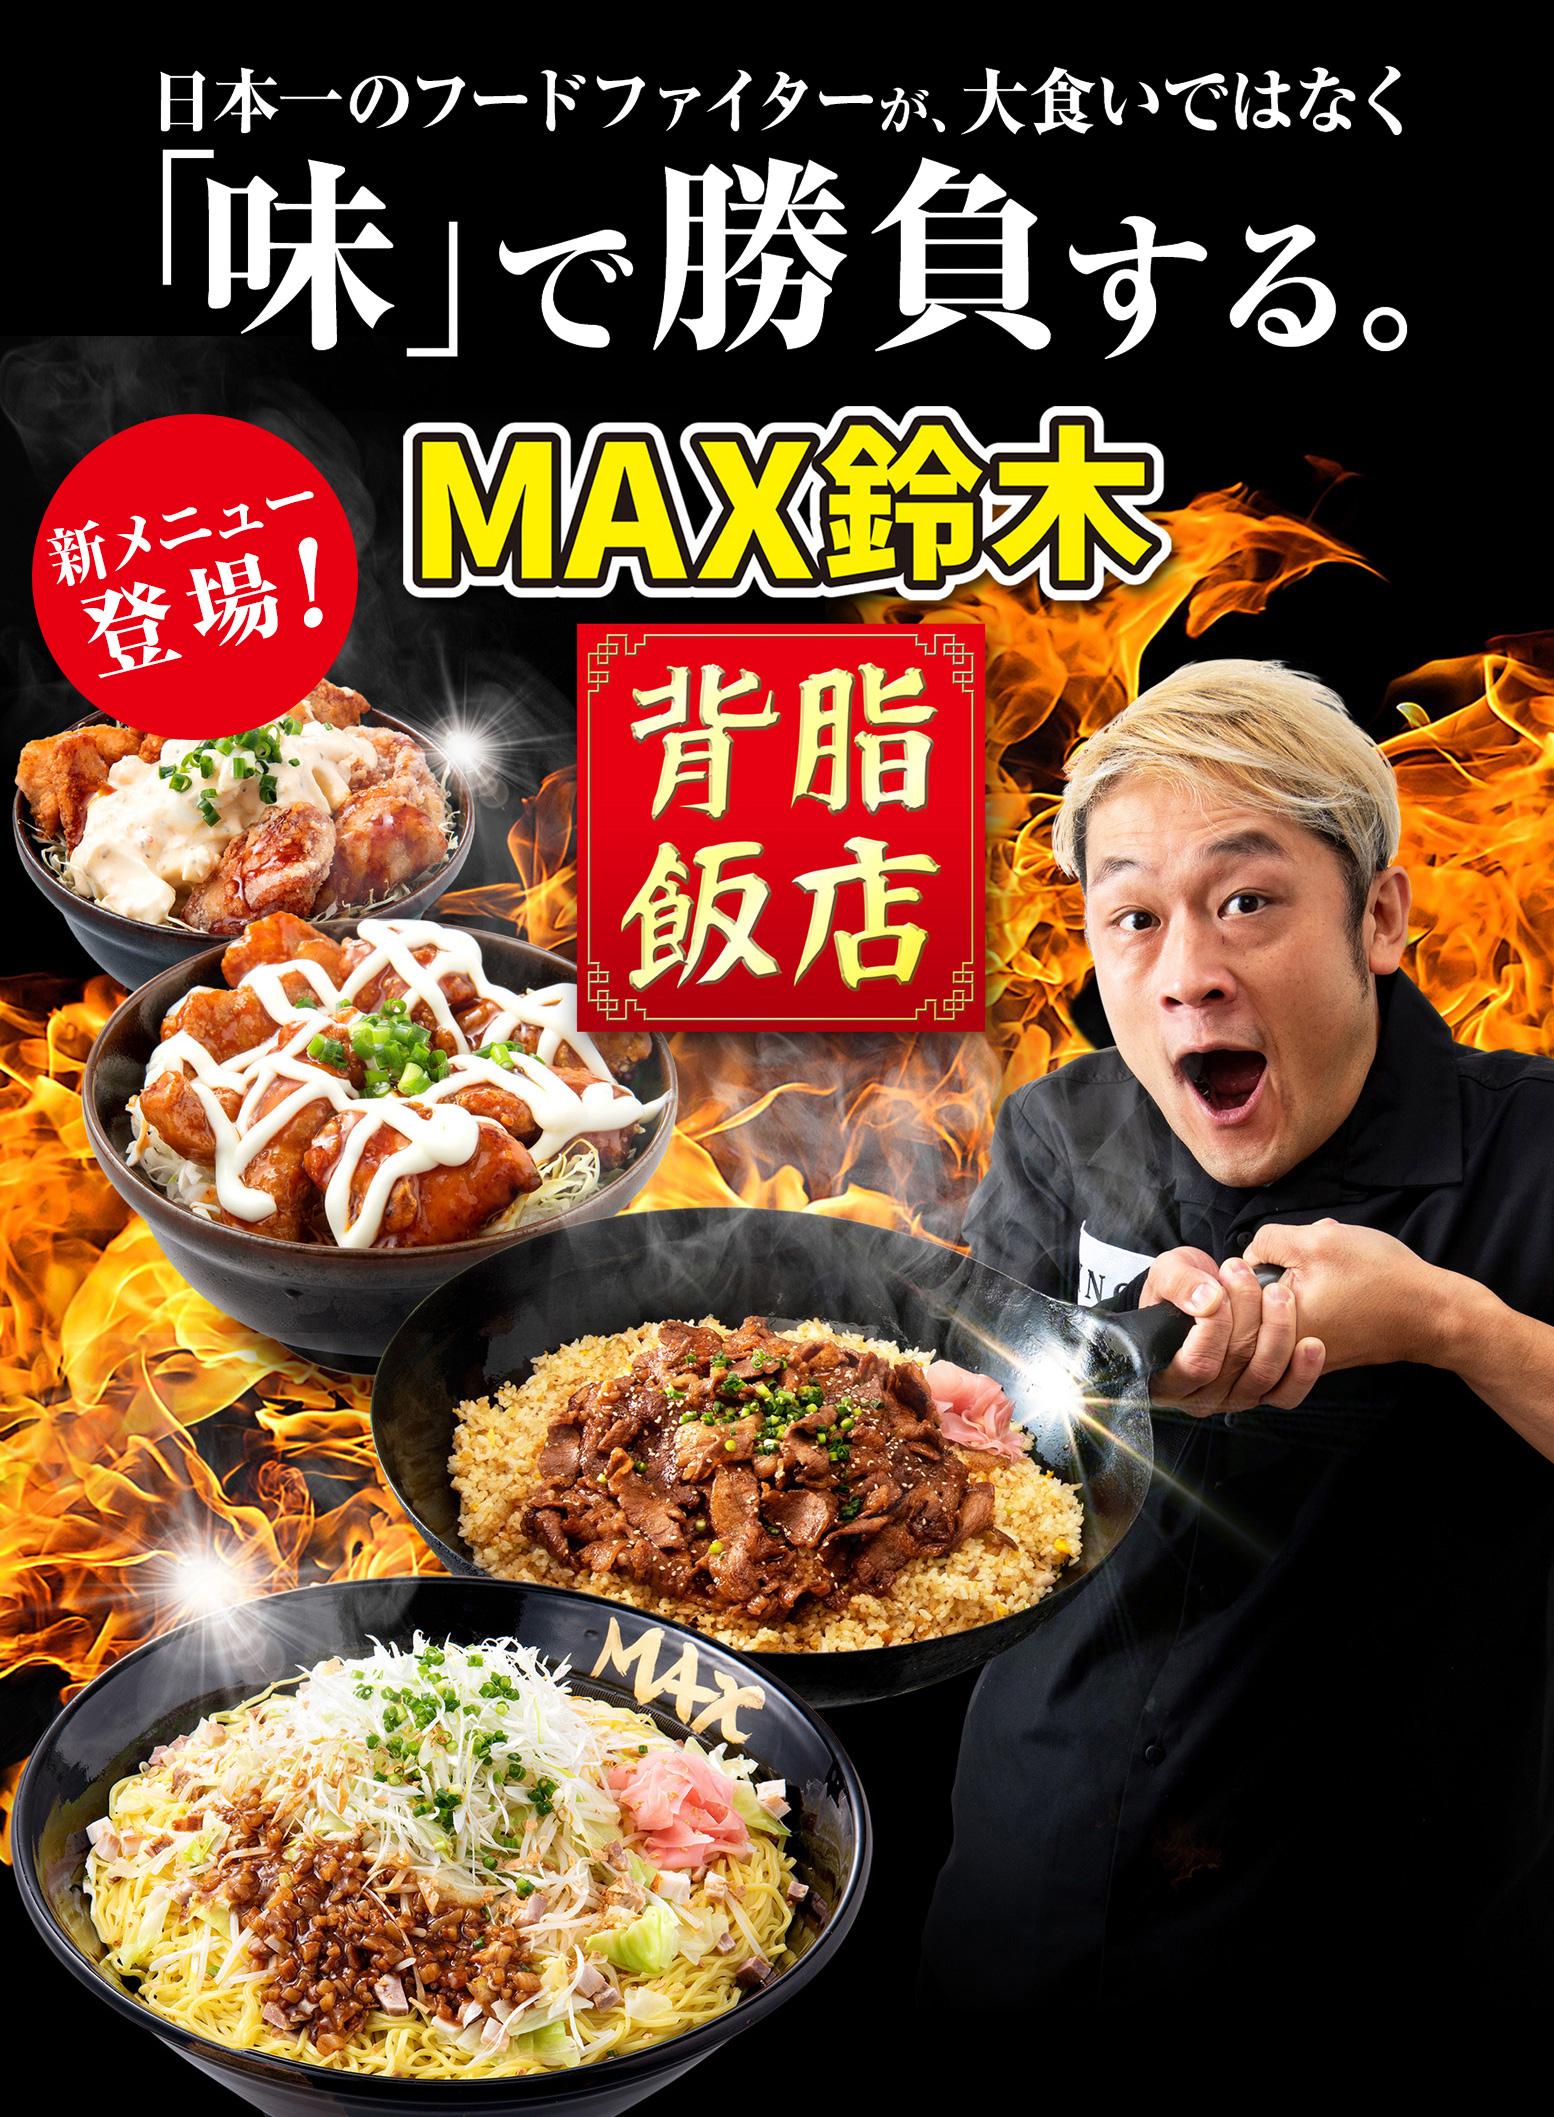 MAX鈴木【背脂飯店】